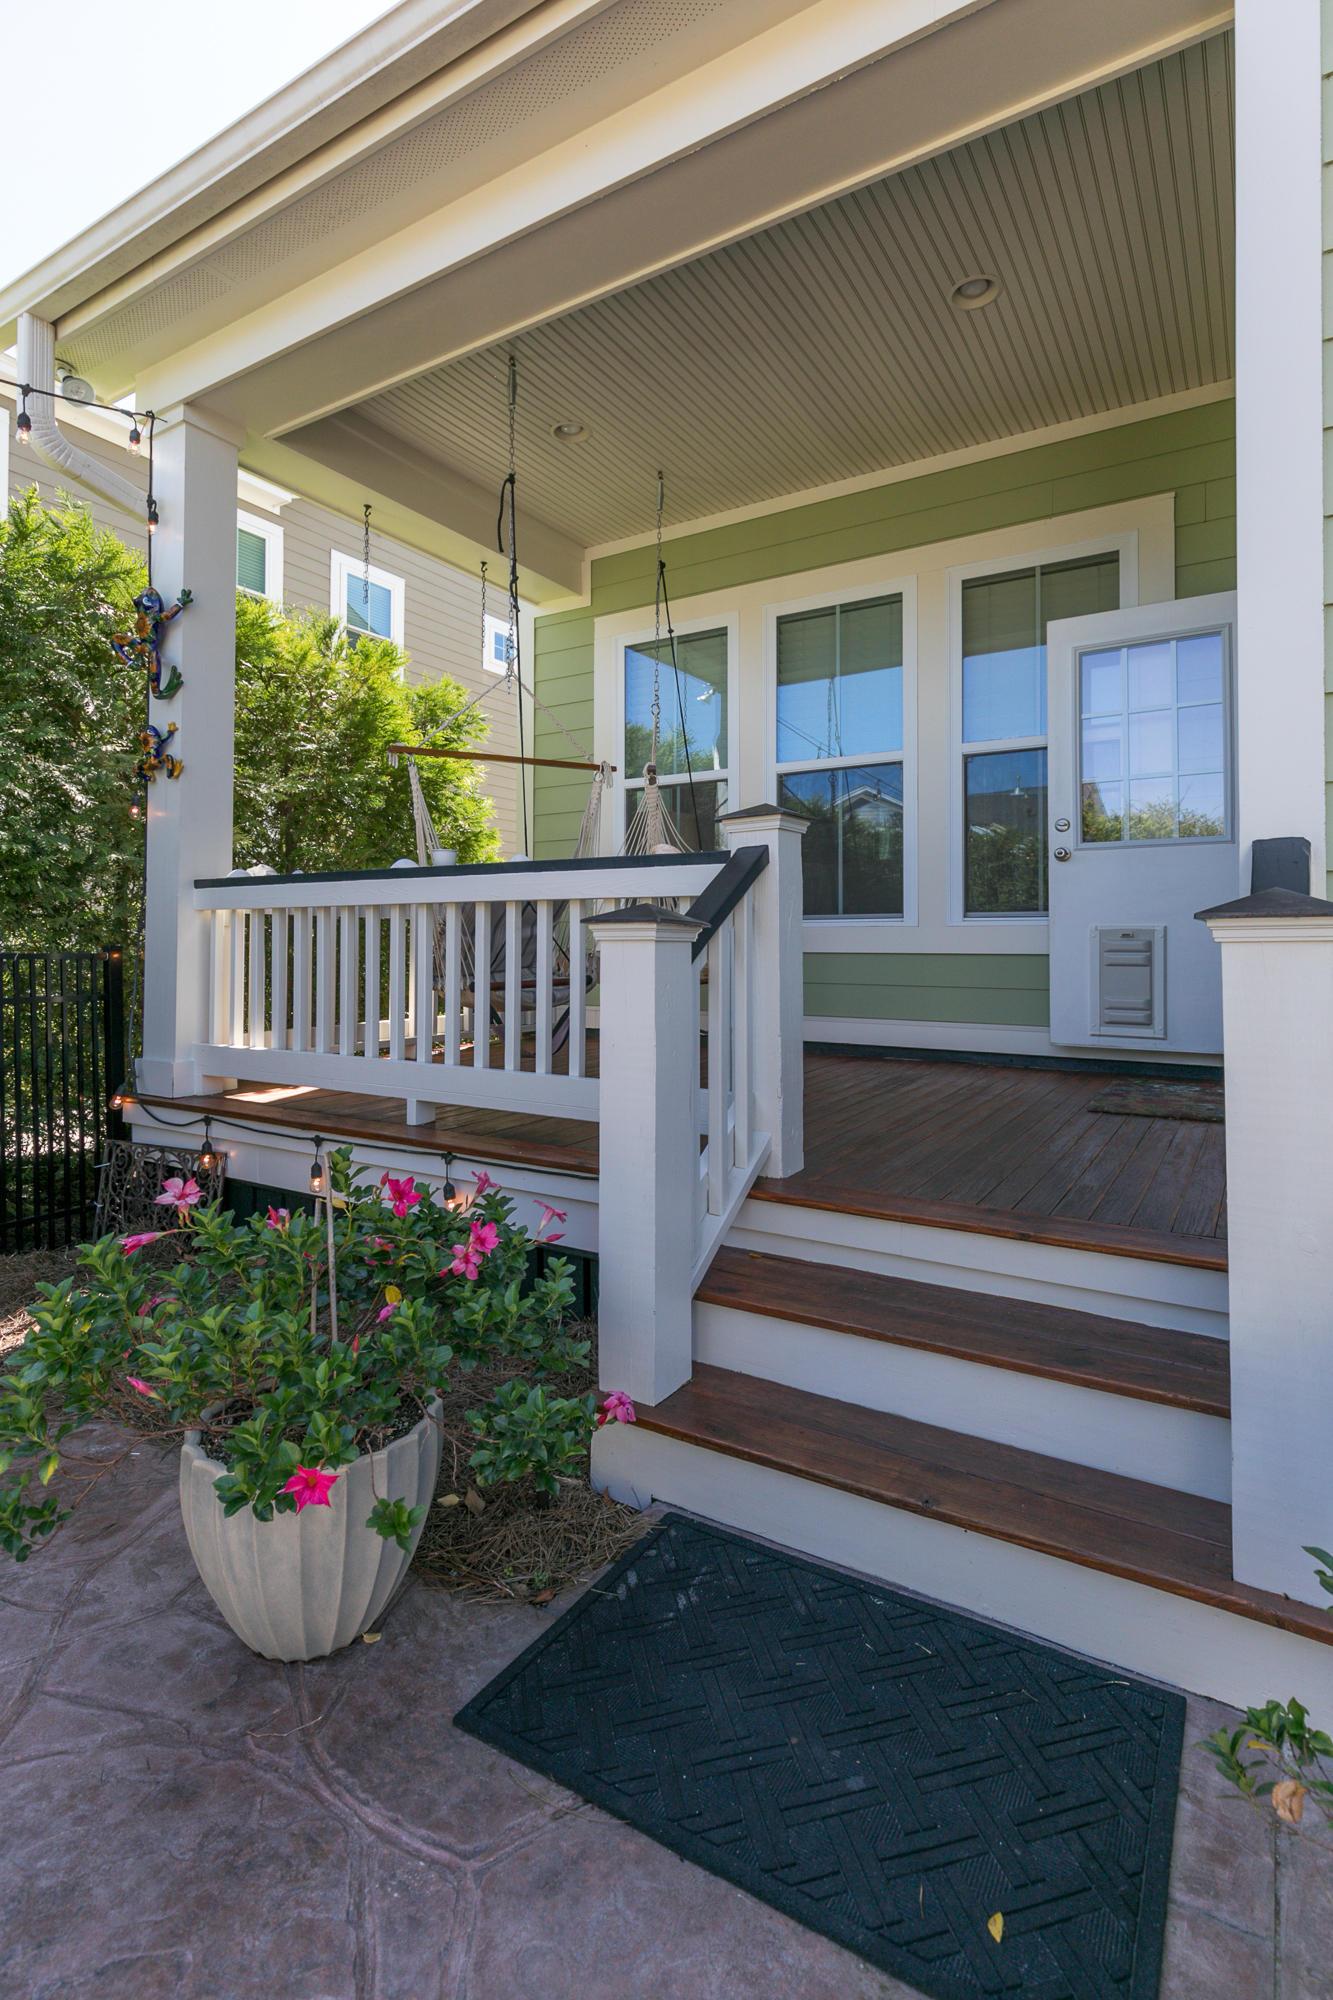 Carolina Park Homes For Sale - 1472 Croaton, Mount Pleasant, SC - 37